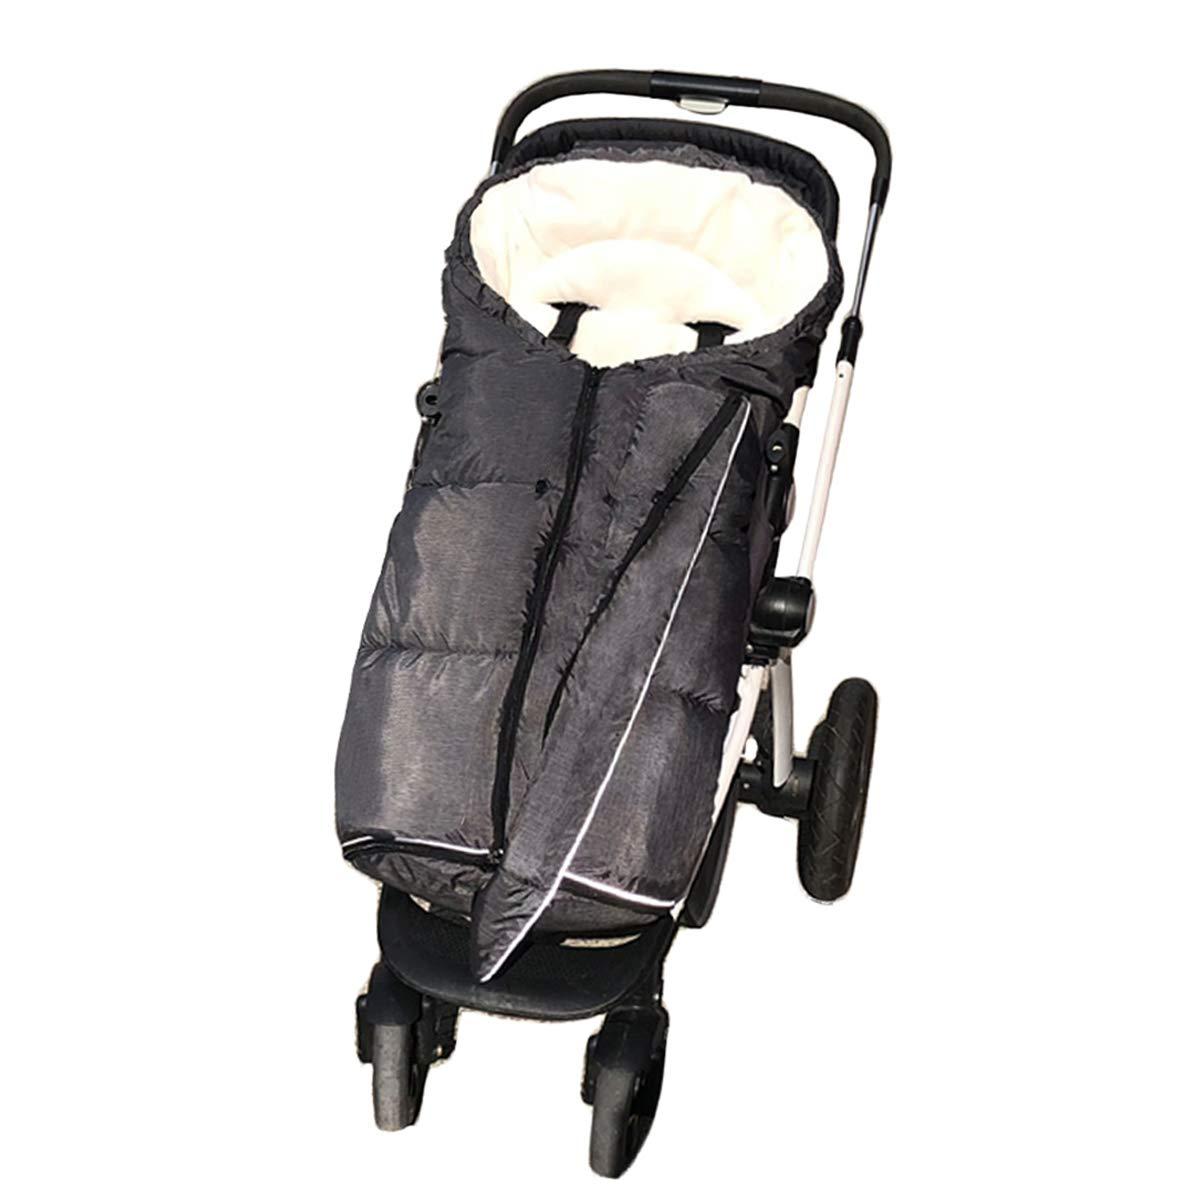 Width Adjustable Universal Stroller Footmuff Designed for Baby Grows,Waterproof High Performace Stroller Bunting Bag,Beige